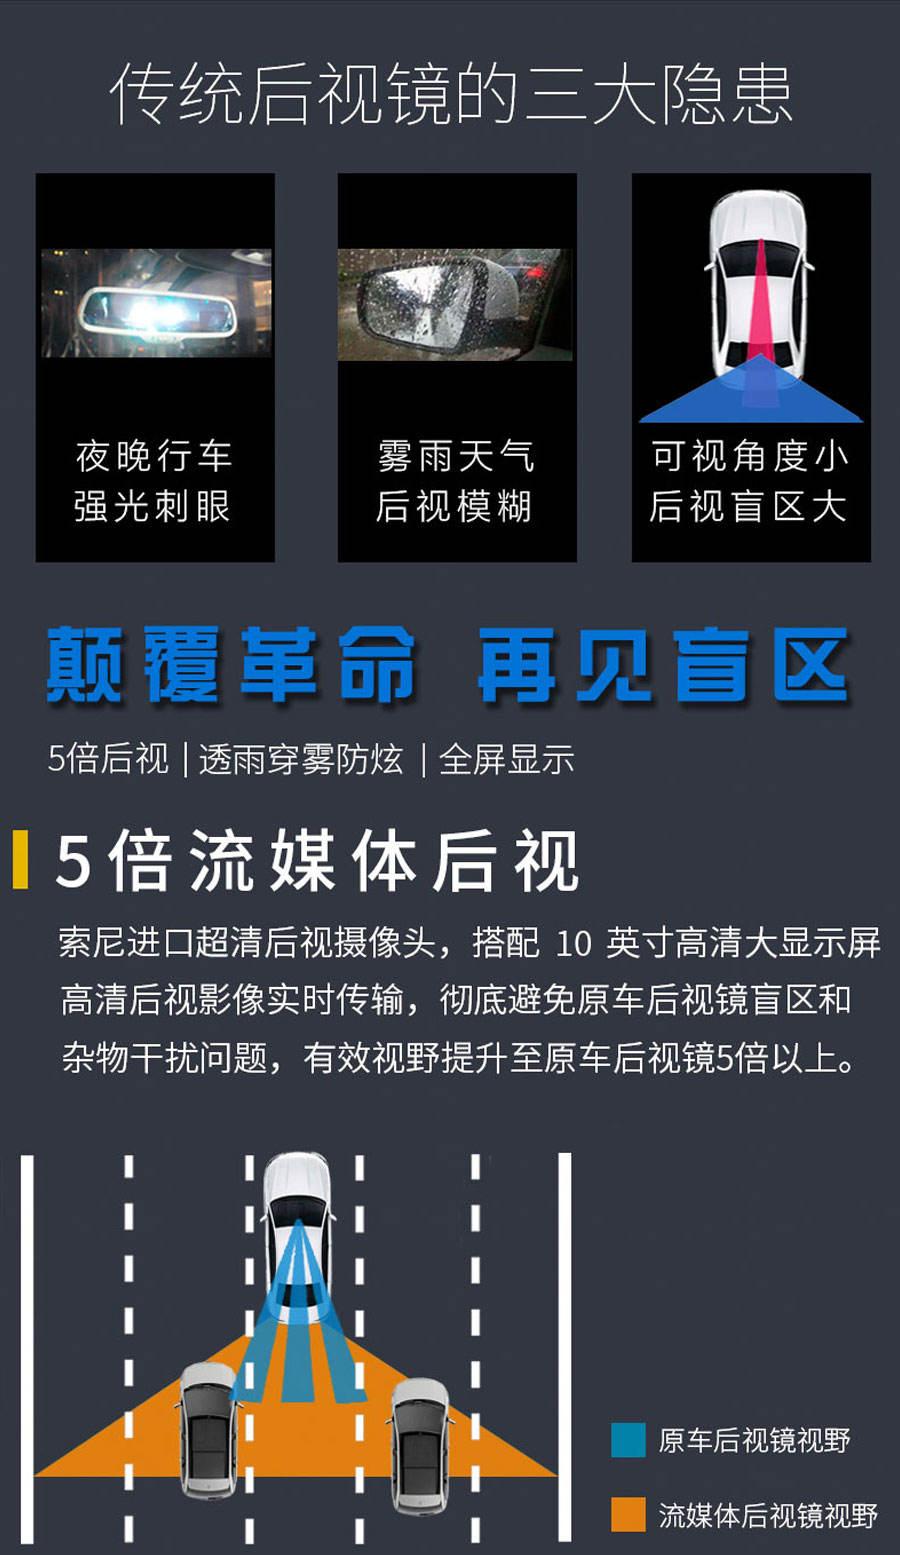 taobao_07.jpg